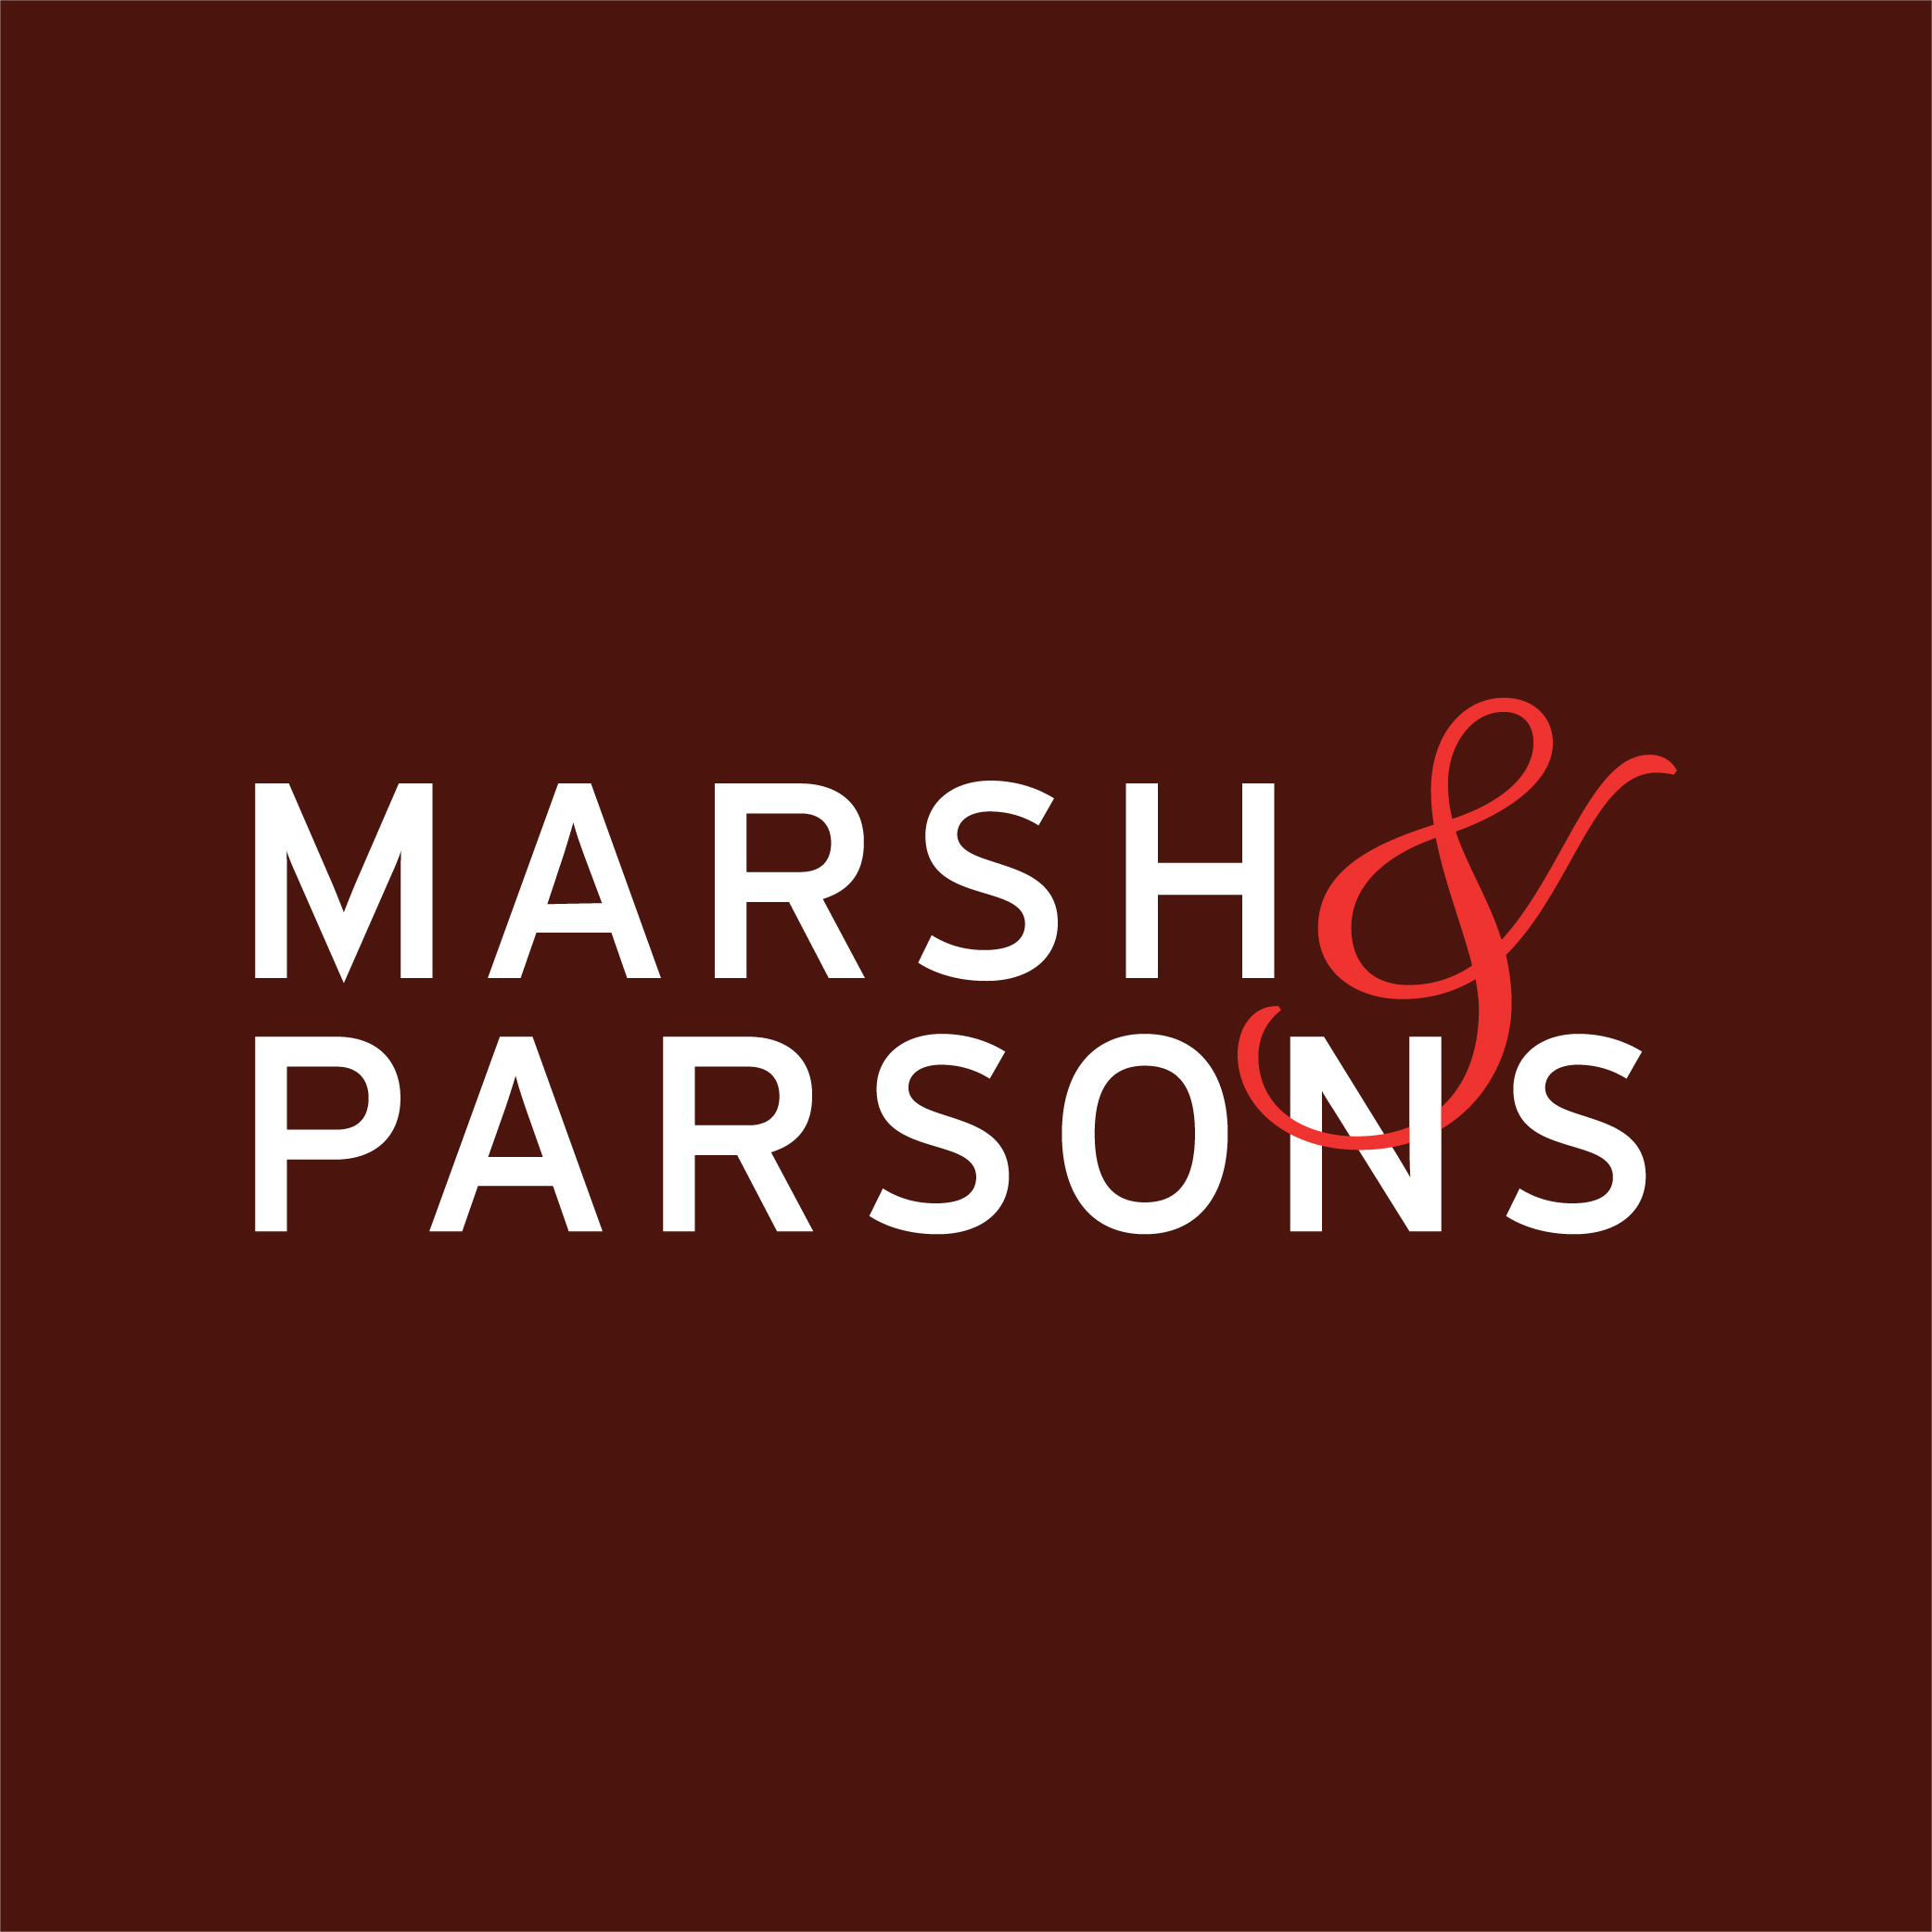 Marsh & Parsons Chiswick Estate Agents